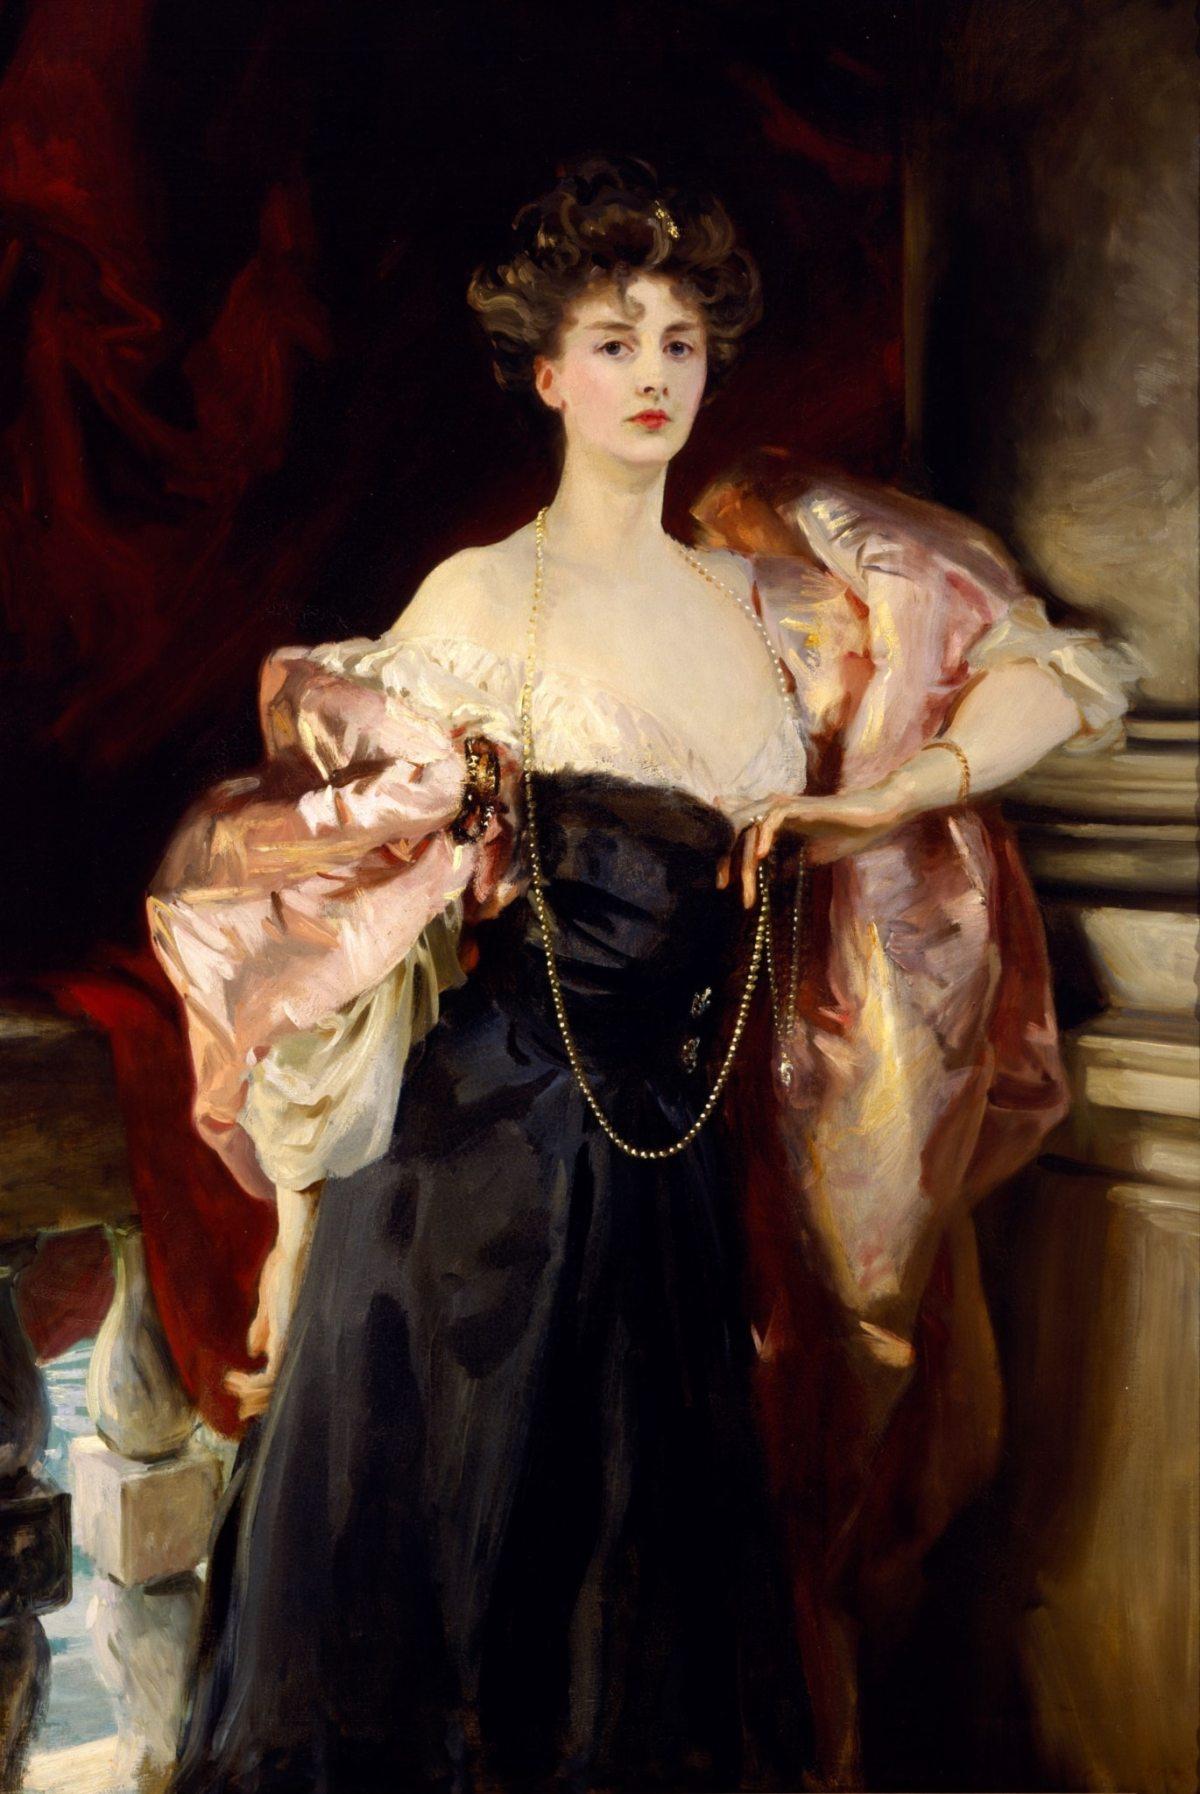 Lady Helen Vincent